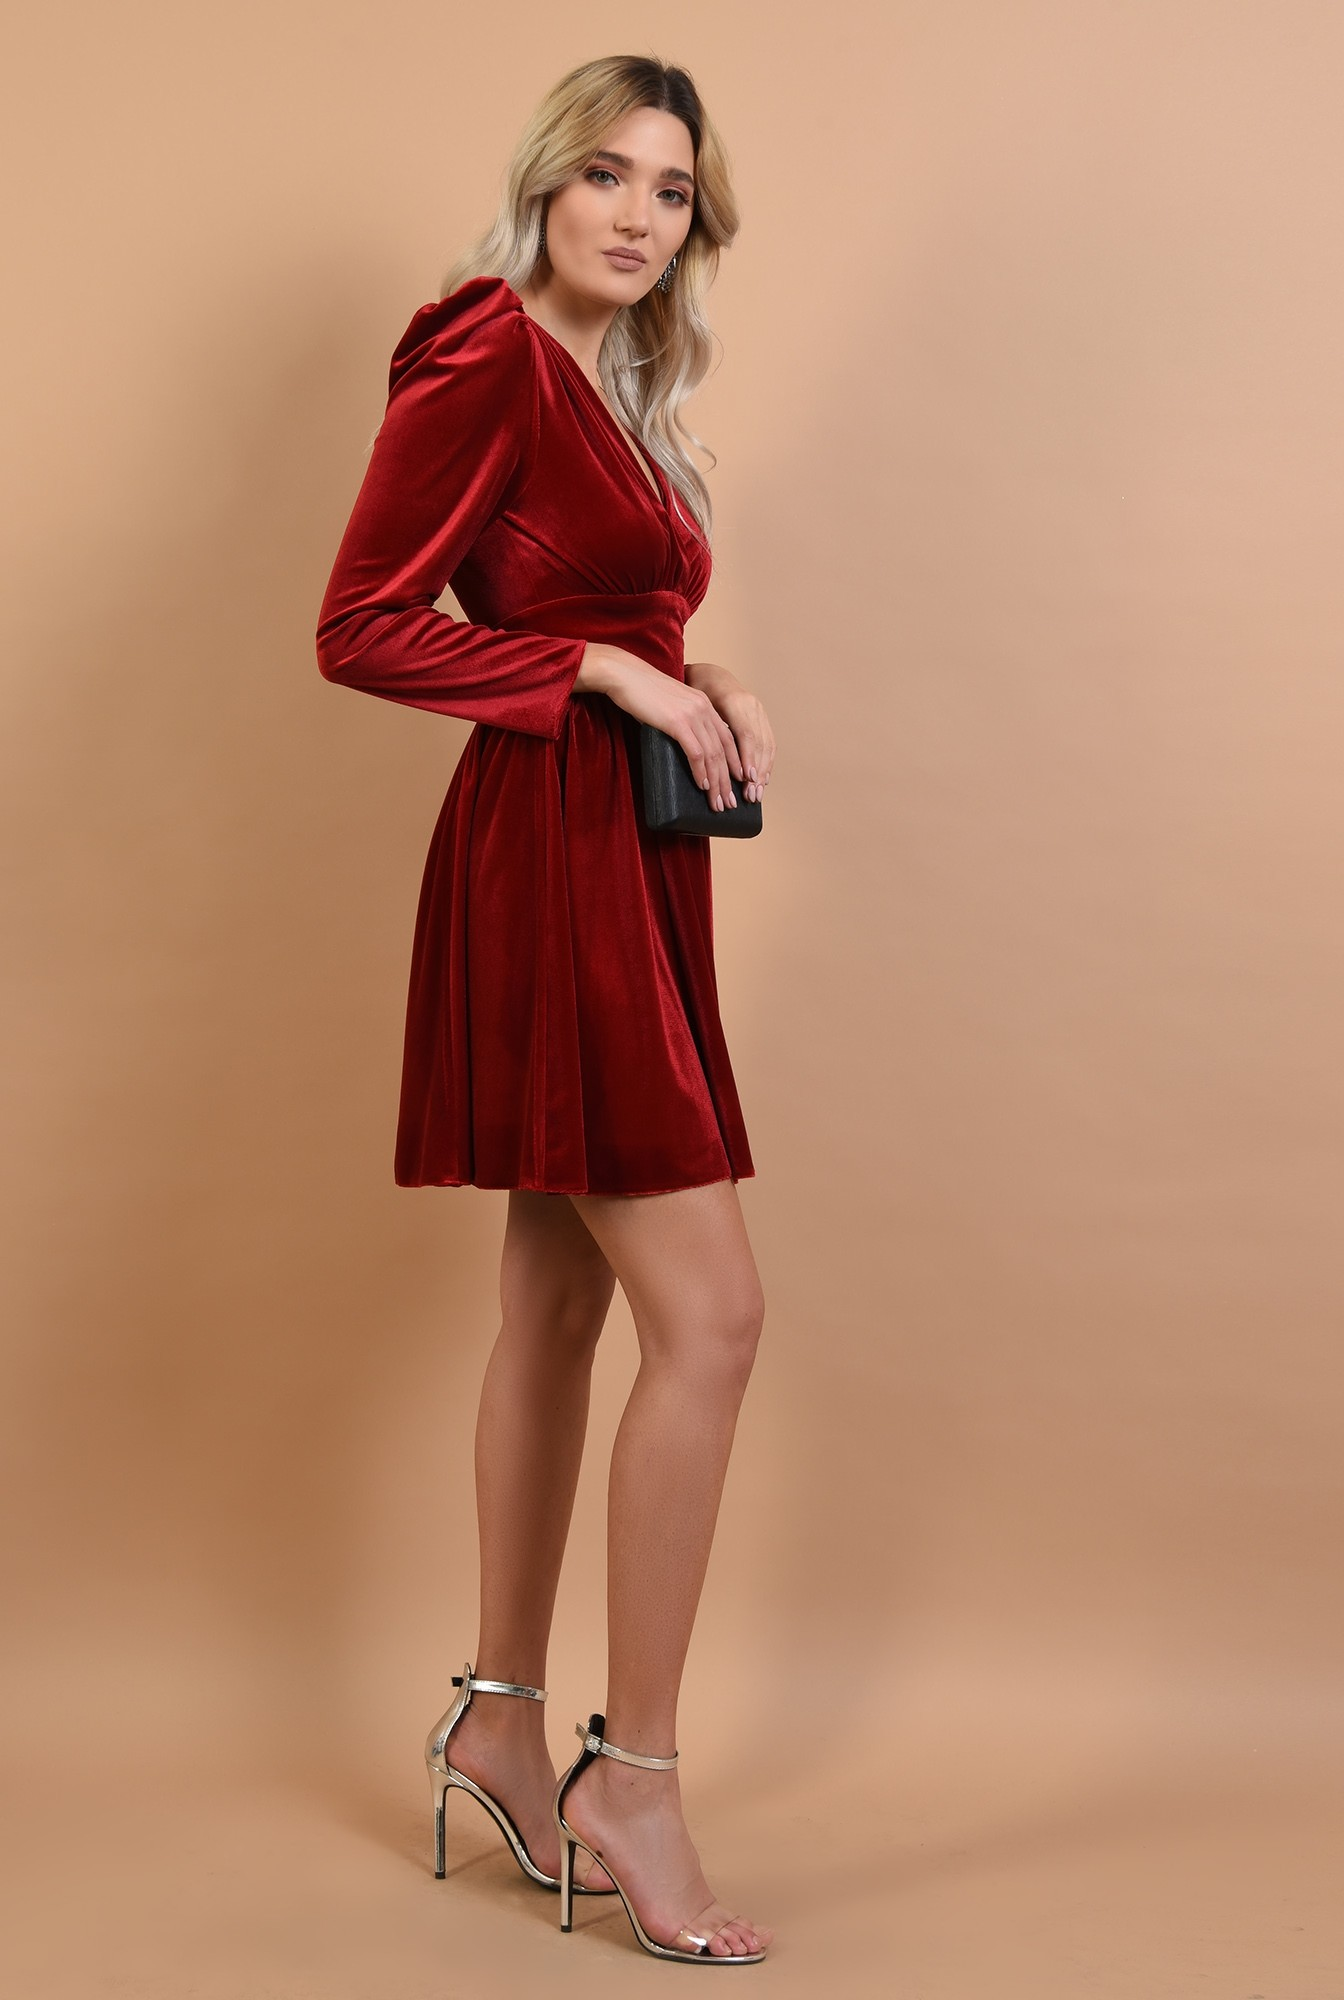 3 - rochie Poema, de seara, din catifea, rosie, clos, anchior petrecut